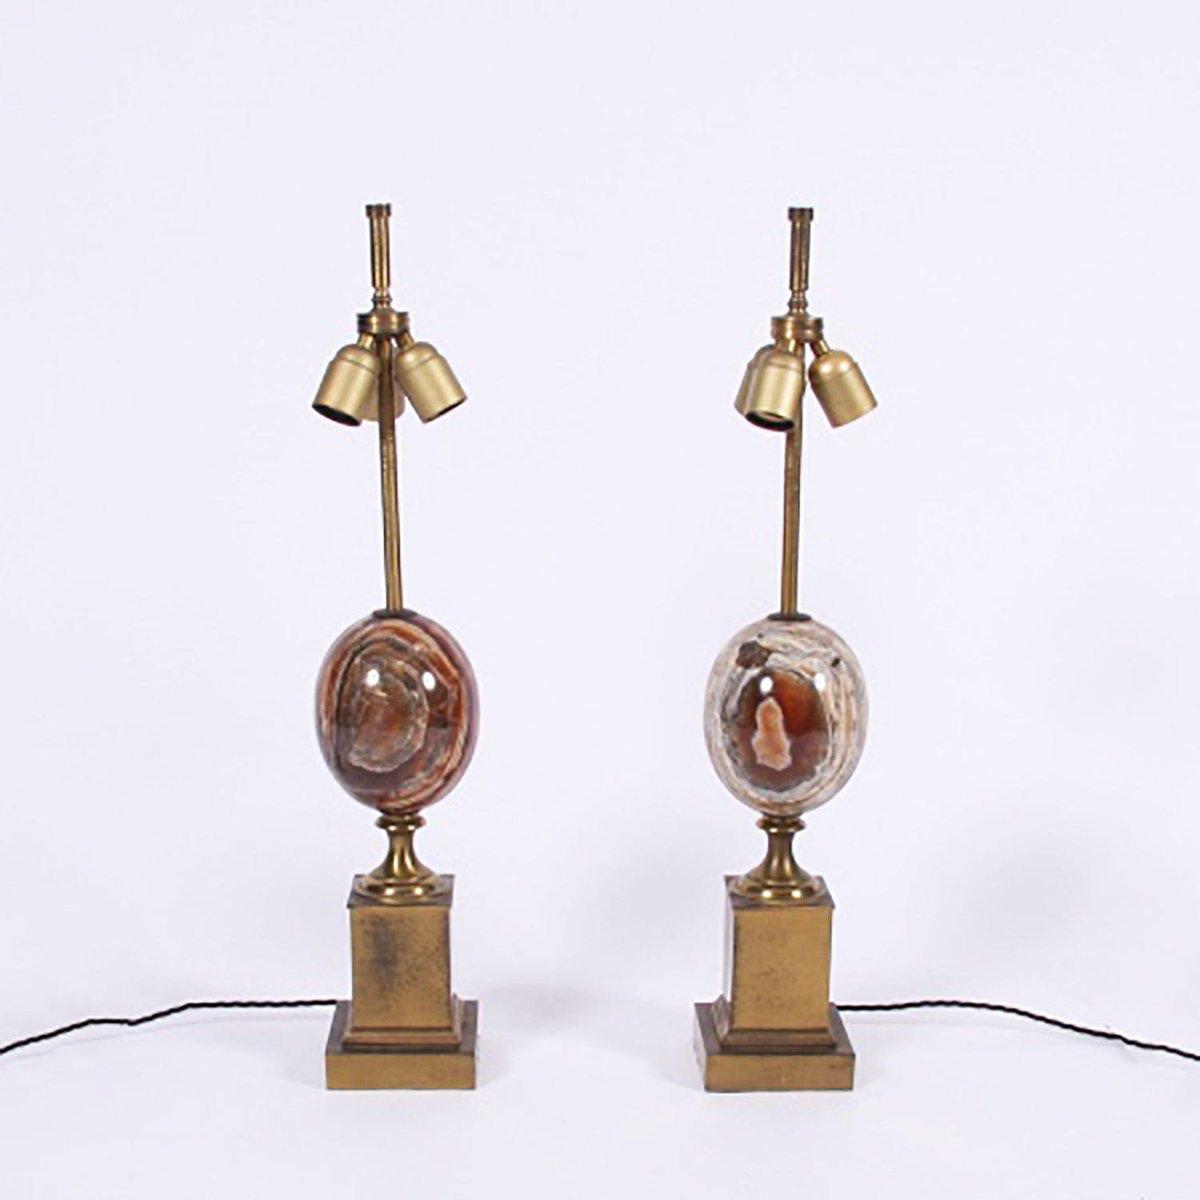 Vintage Tischlampen von Maison Charles, 1960er, 2er Set